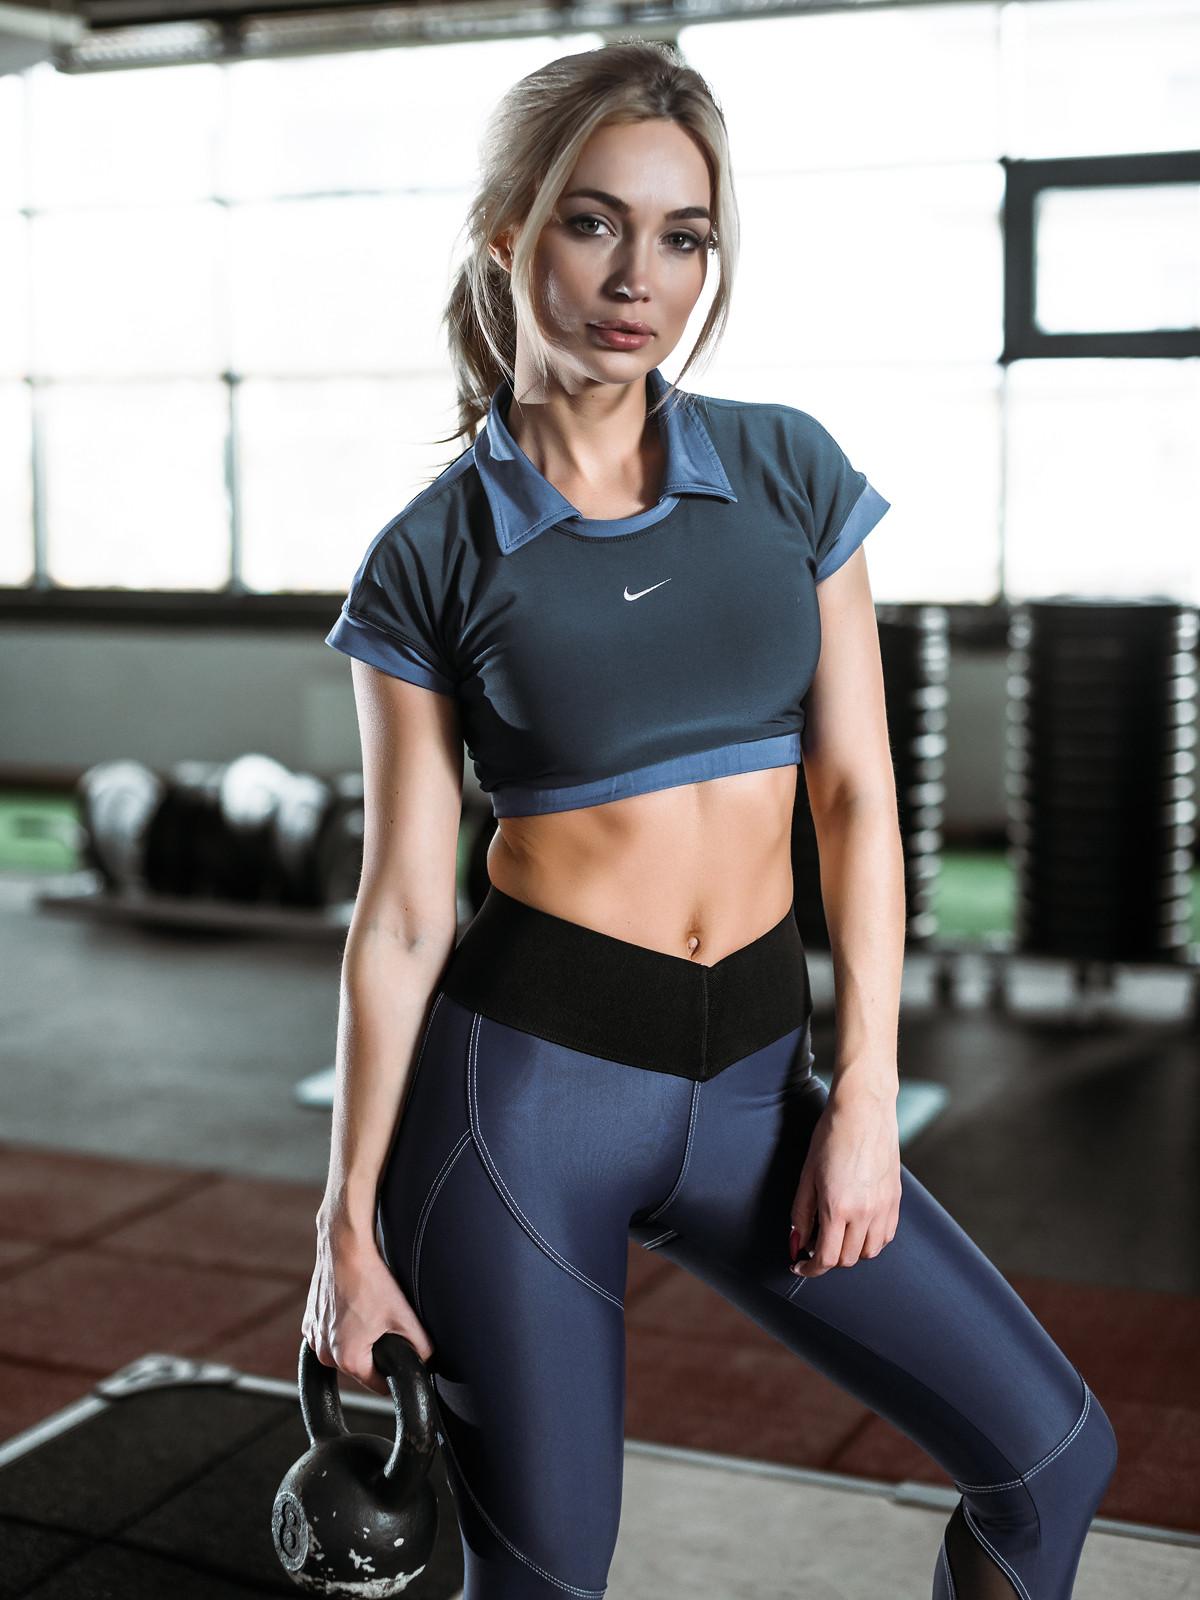 discount sale latest design better спорт фитнес зож девушка fitnes girls girl body sexy olymp